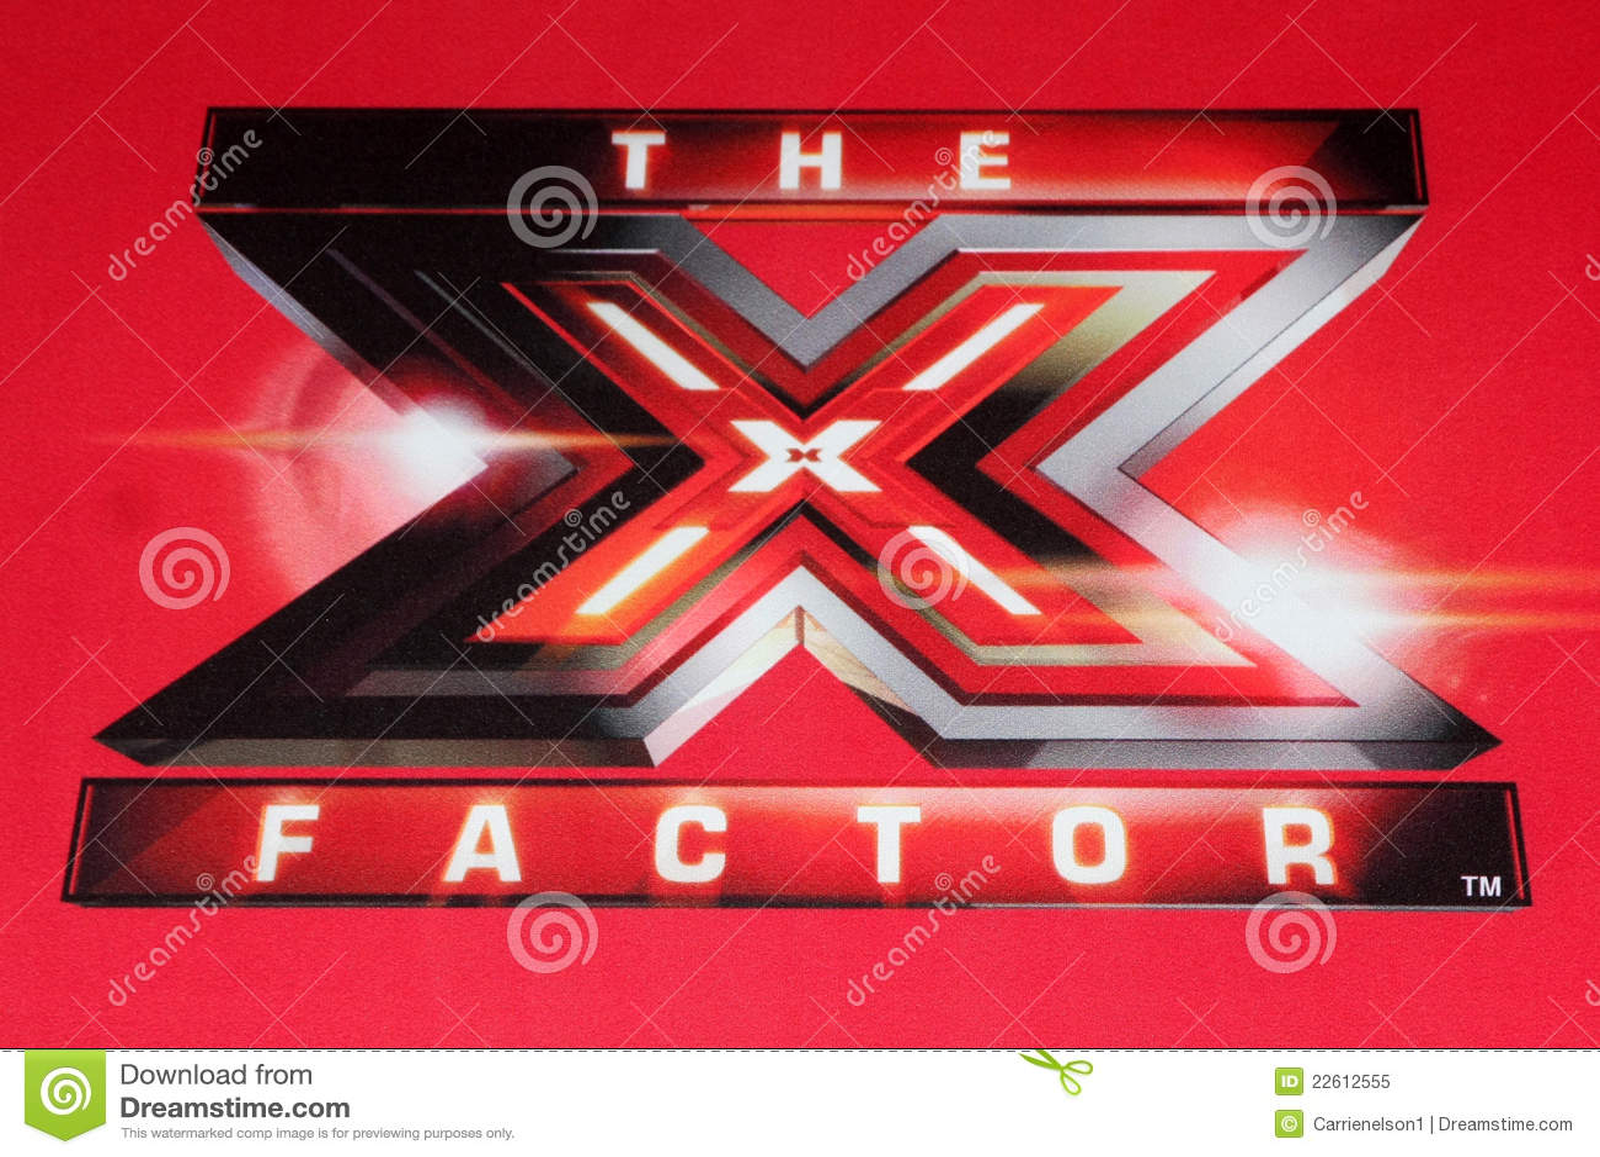 x factor logo at the foxs editorial image image of press